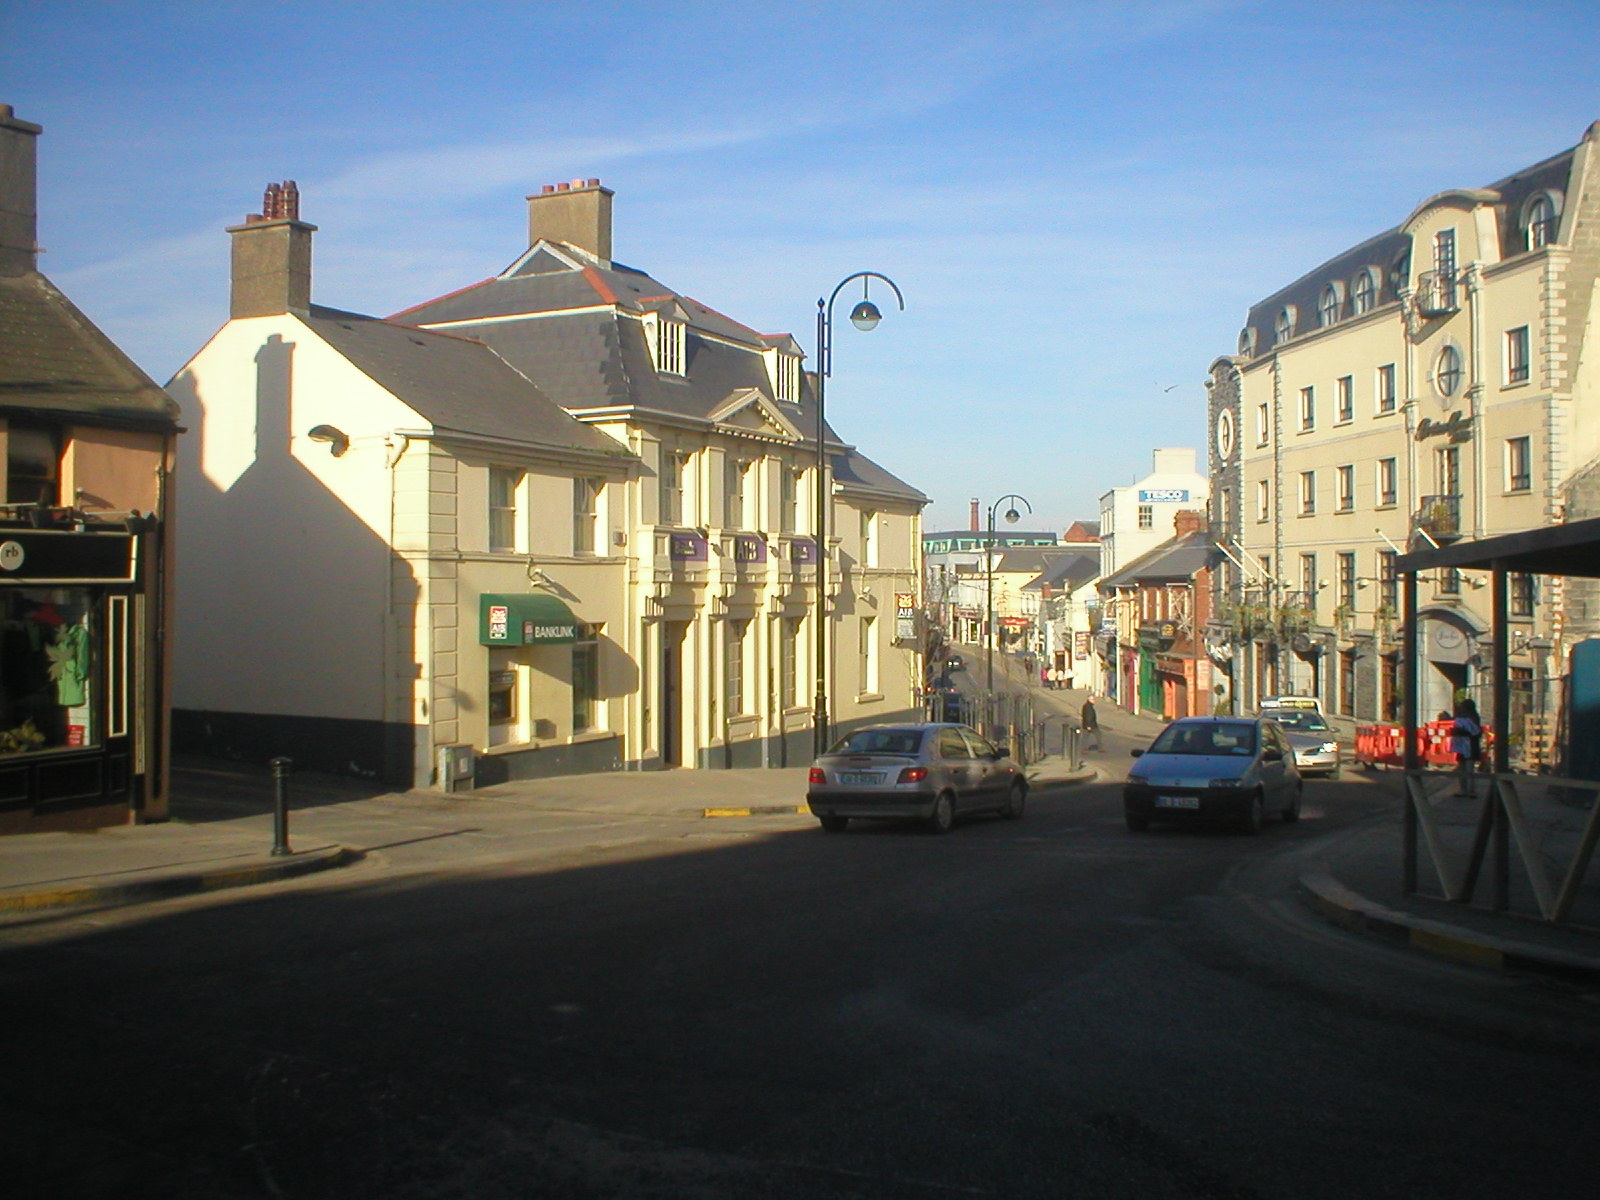 Balbriggan dating site - free online dating in Balbriggan (Ireland)